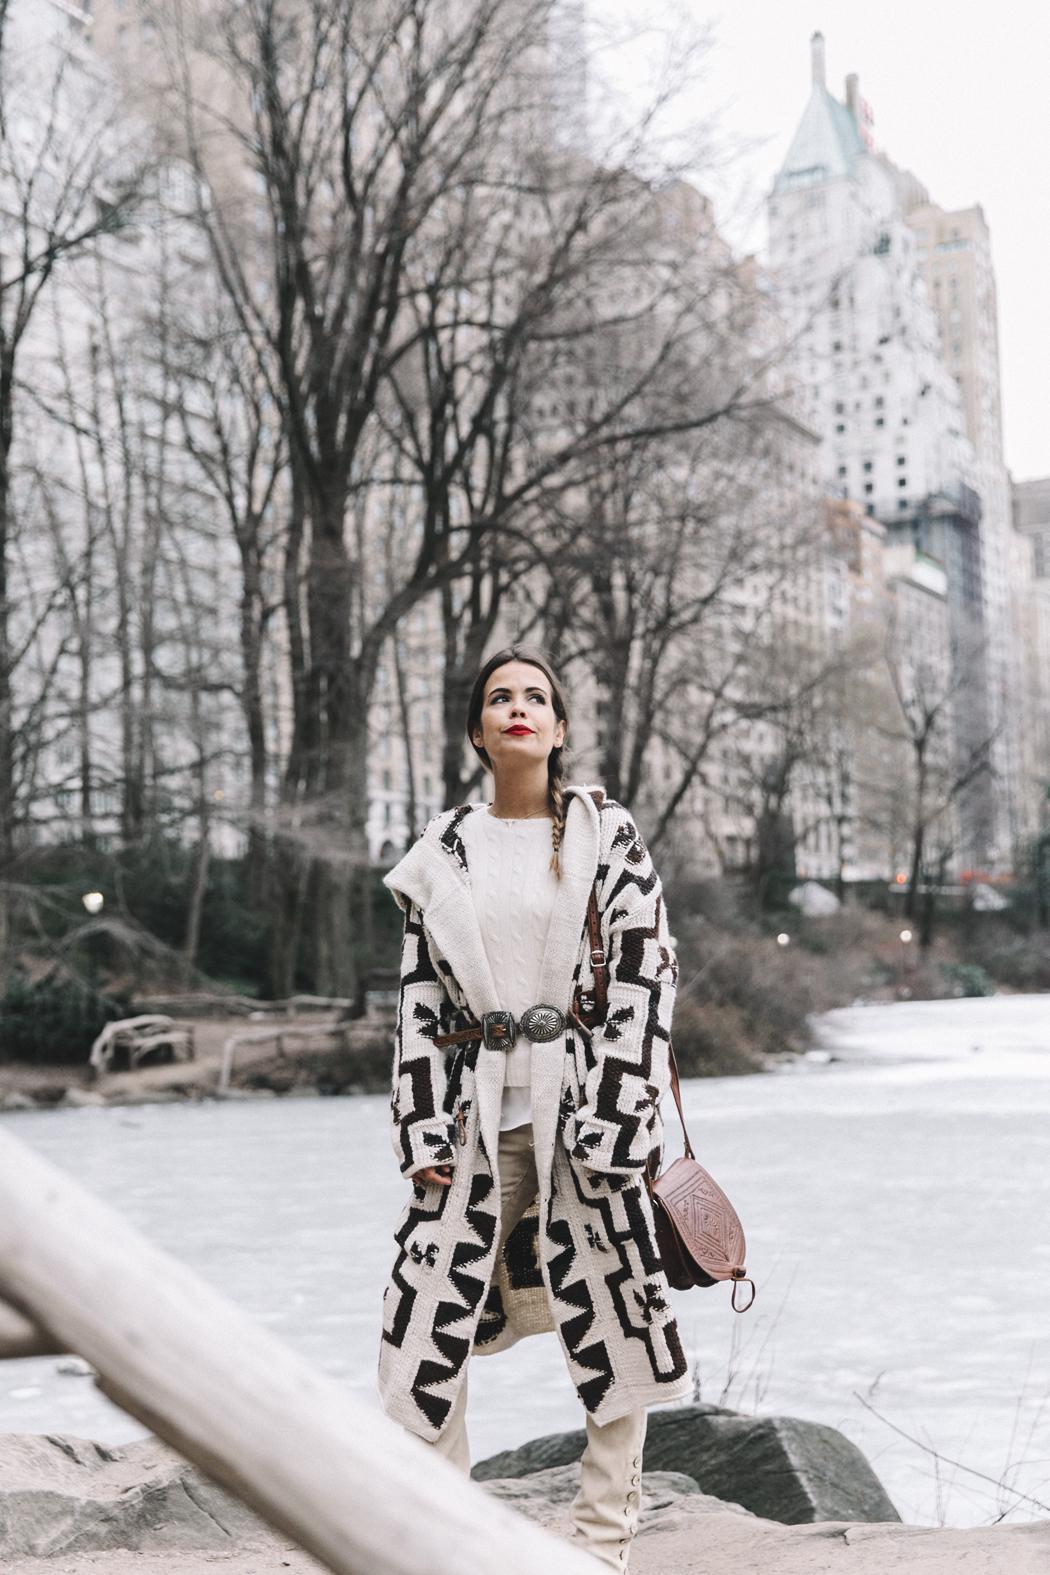 Polo_Ralph_Lauren_Collage_Vintage-Street_Style-NYFW-New_York_Fashion_Week-Knit_Jacket-Cream_Trousers-Boho-Winter_White-